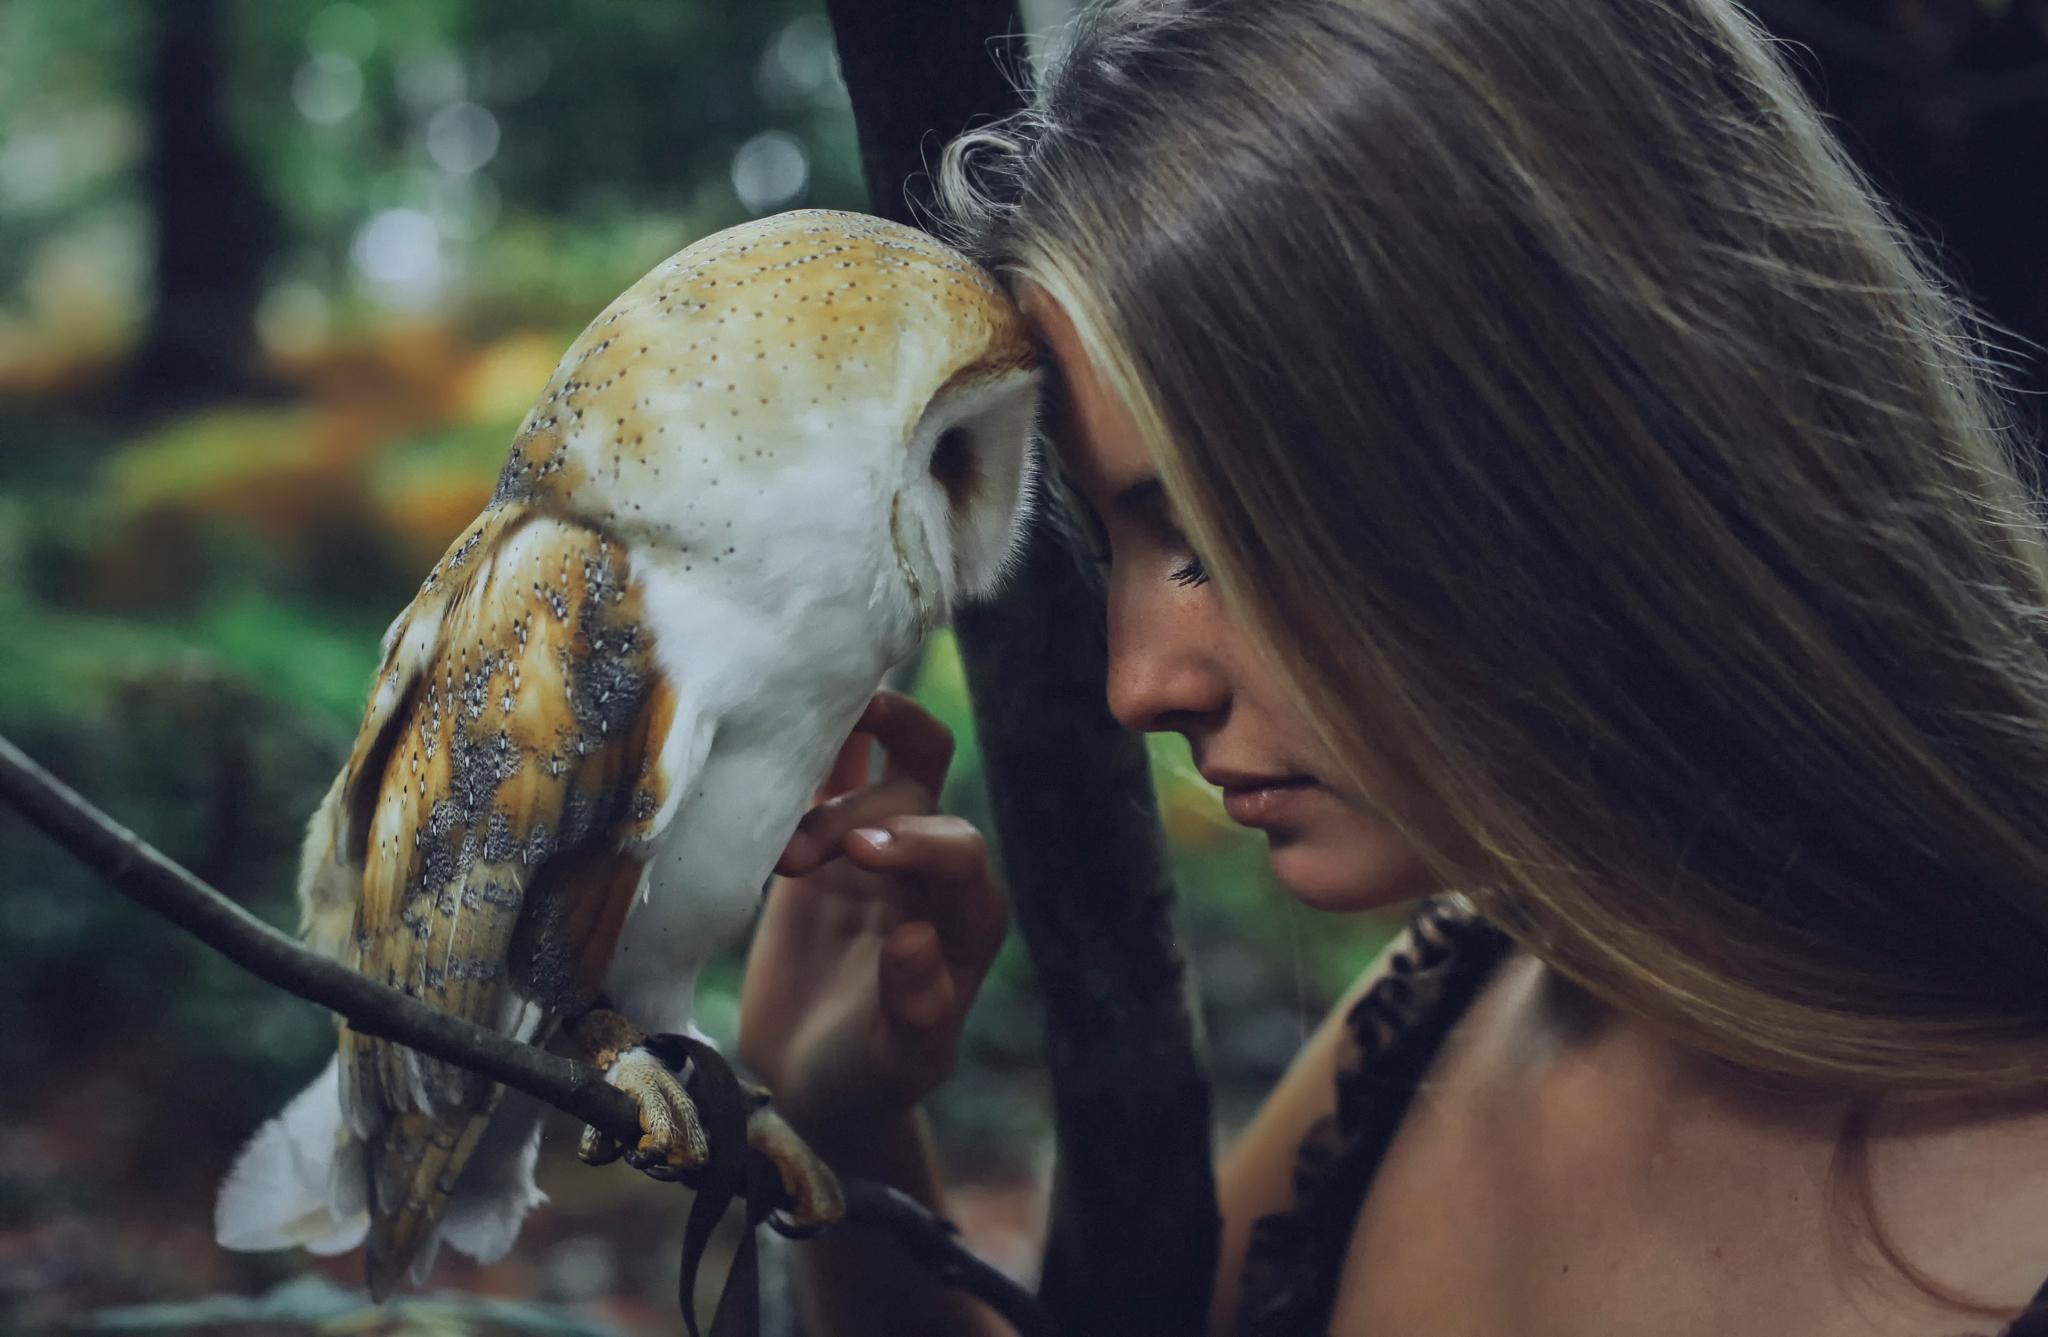 ptáci a dívkyzralé Cumming